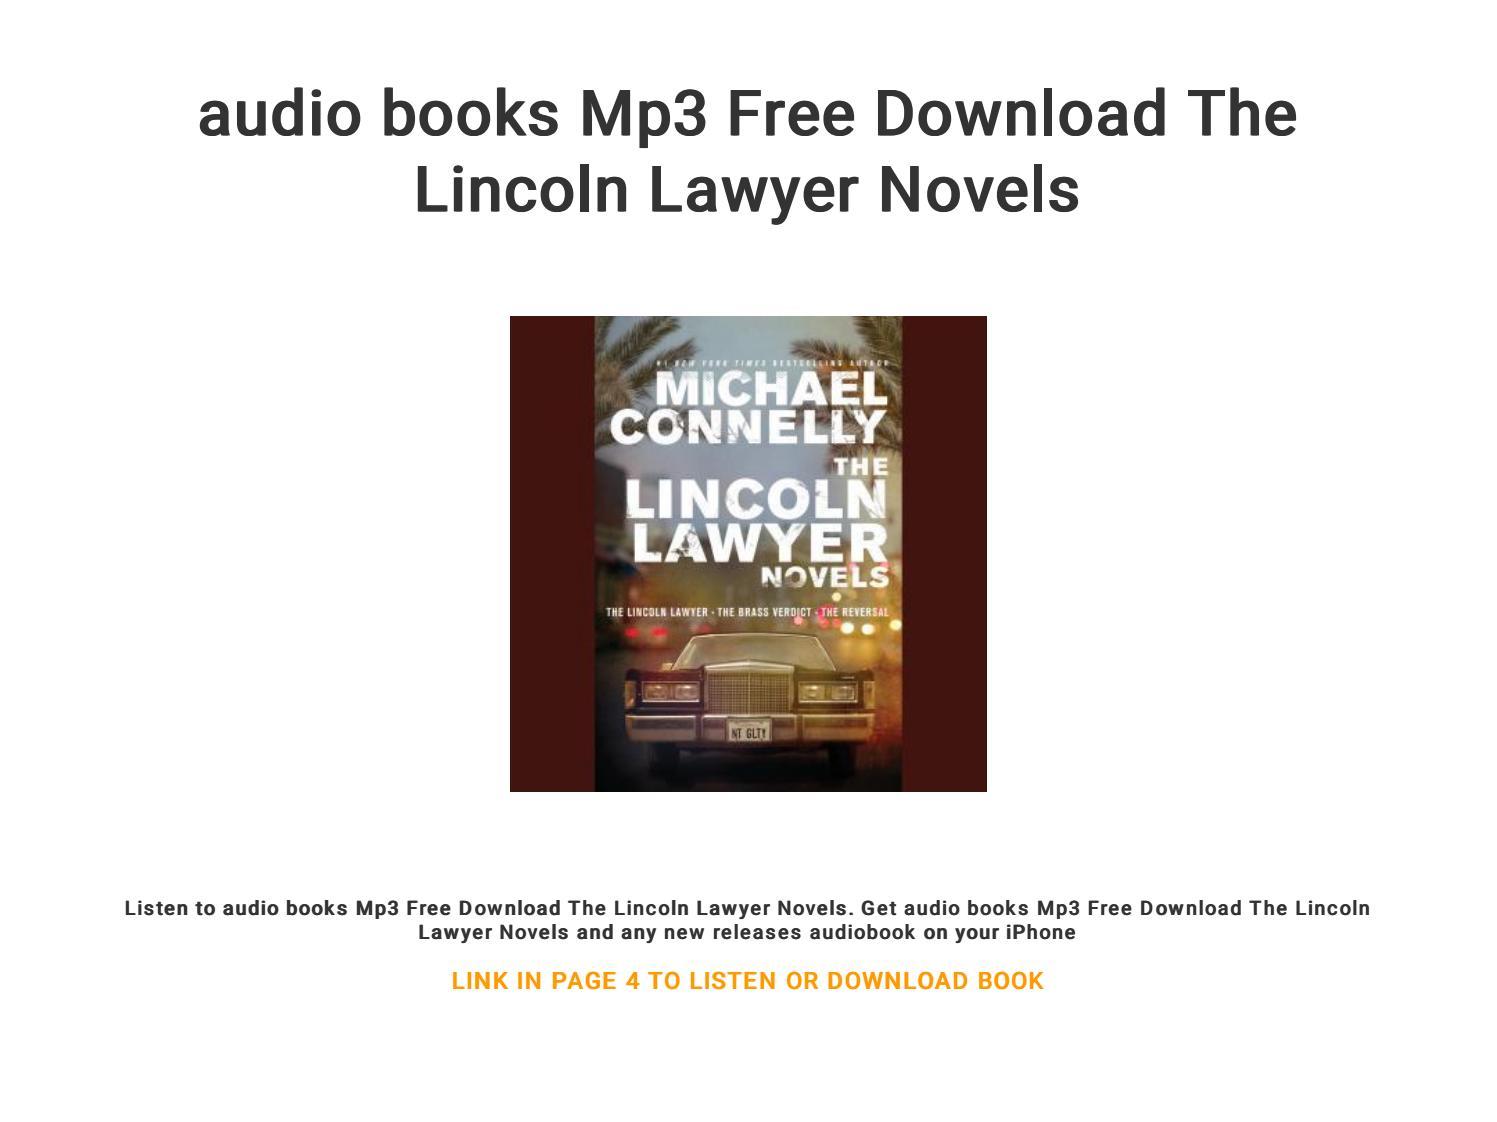 audio books free download